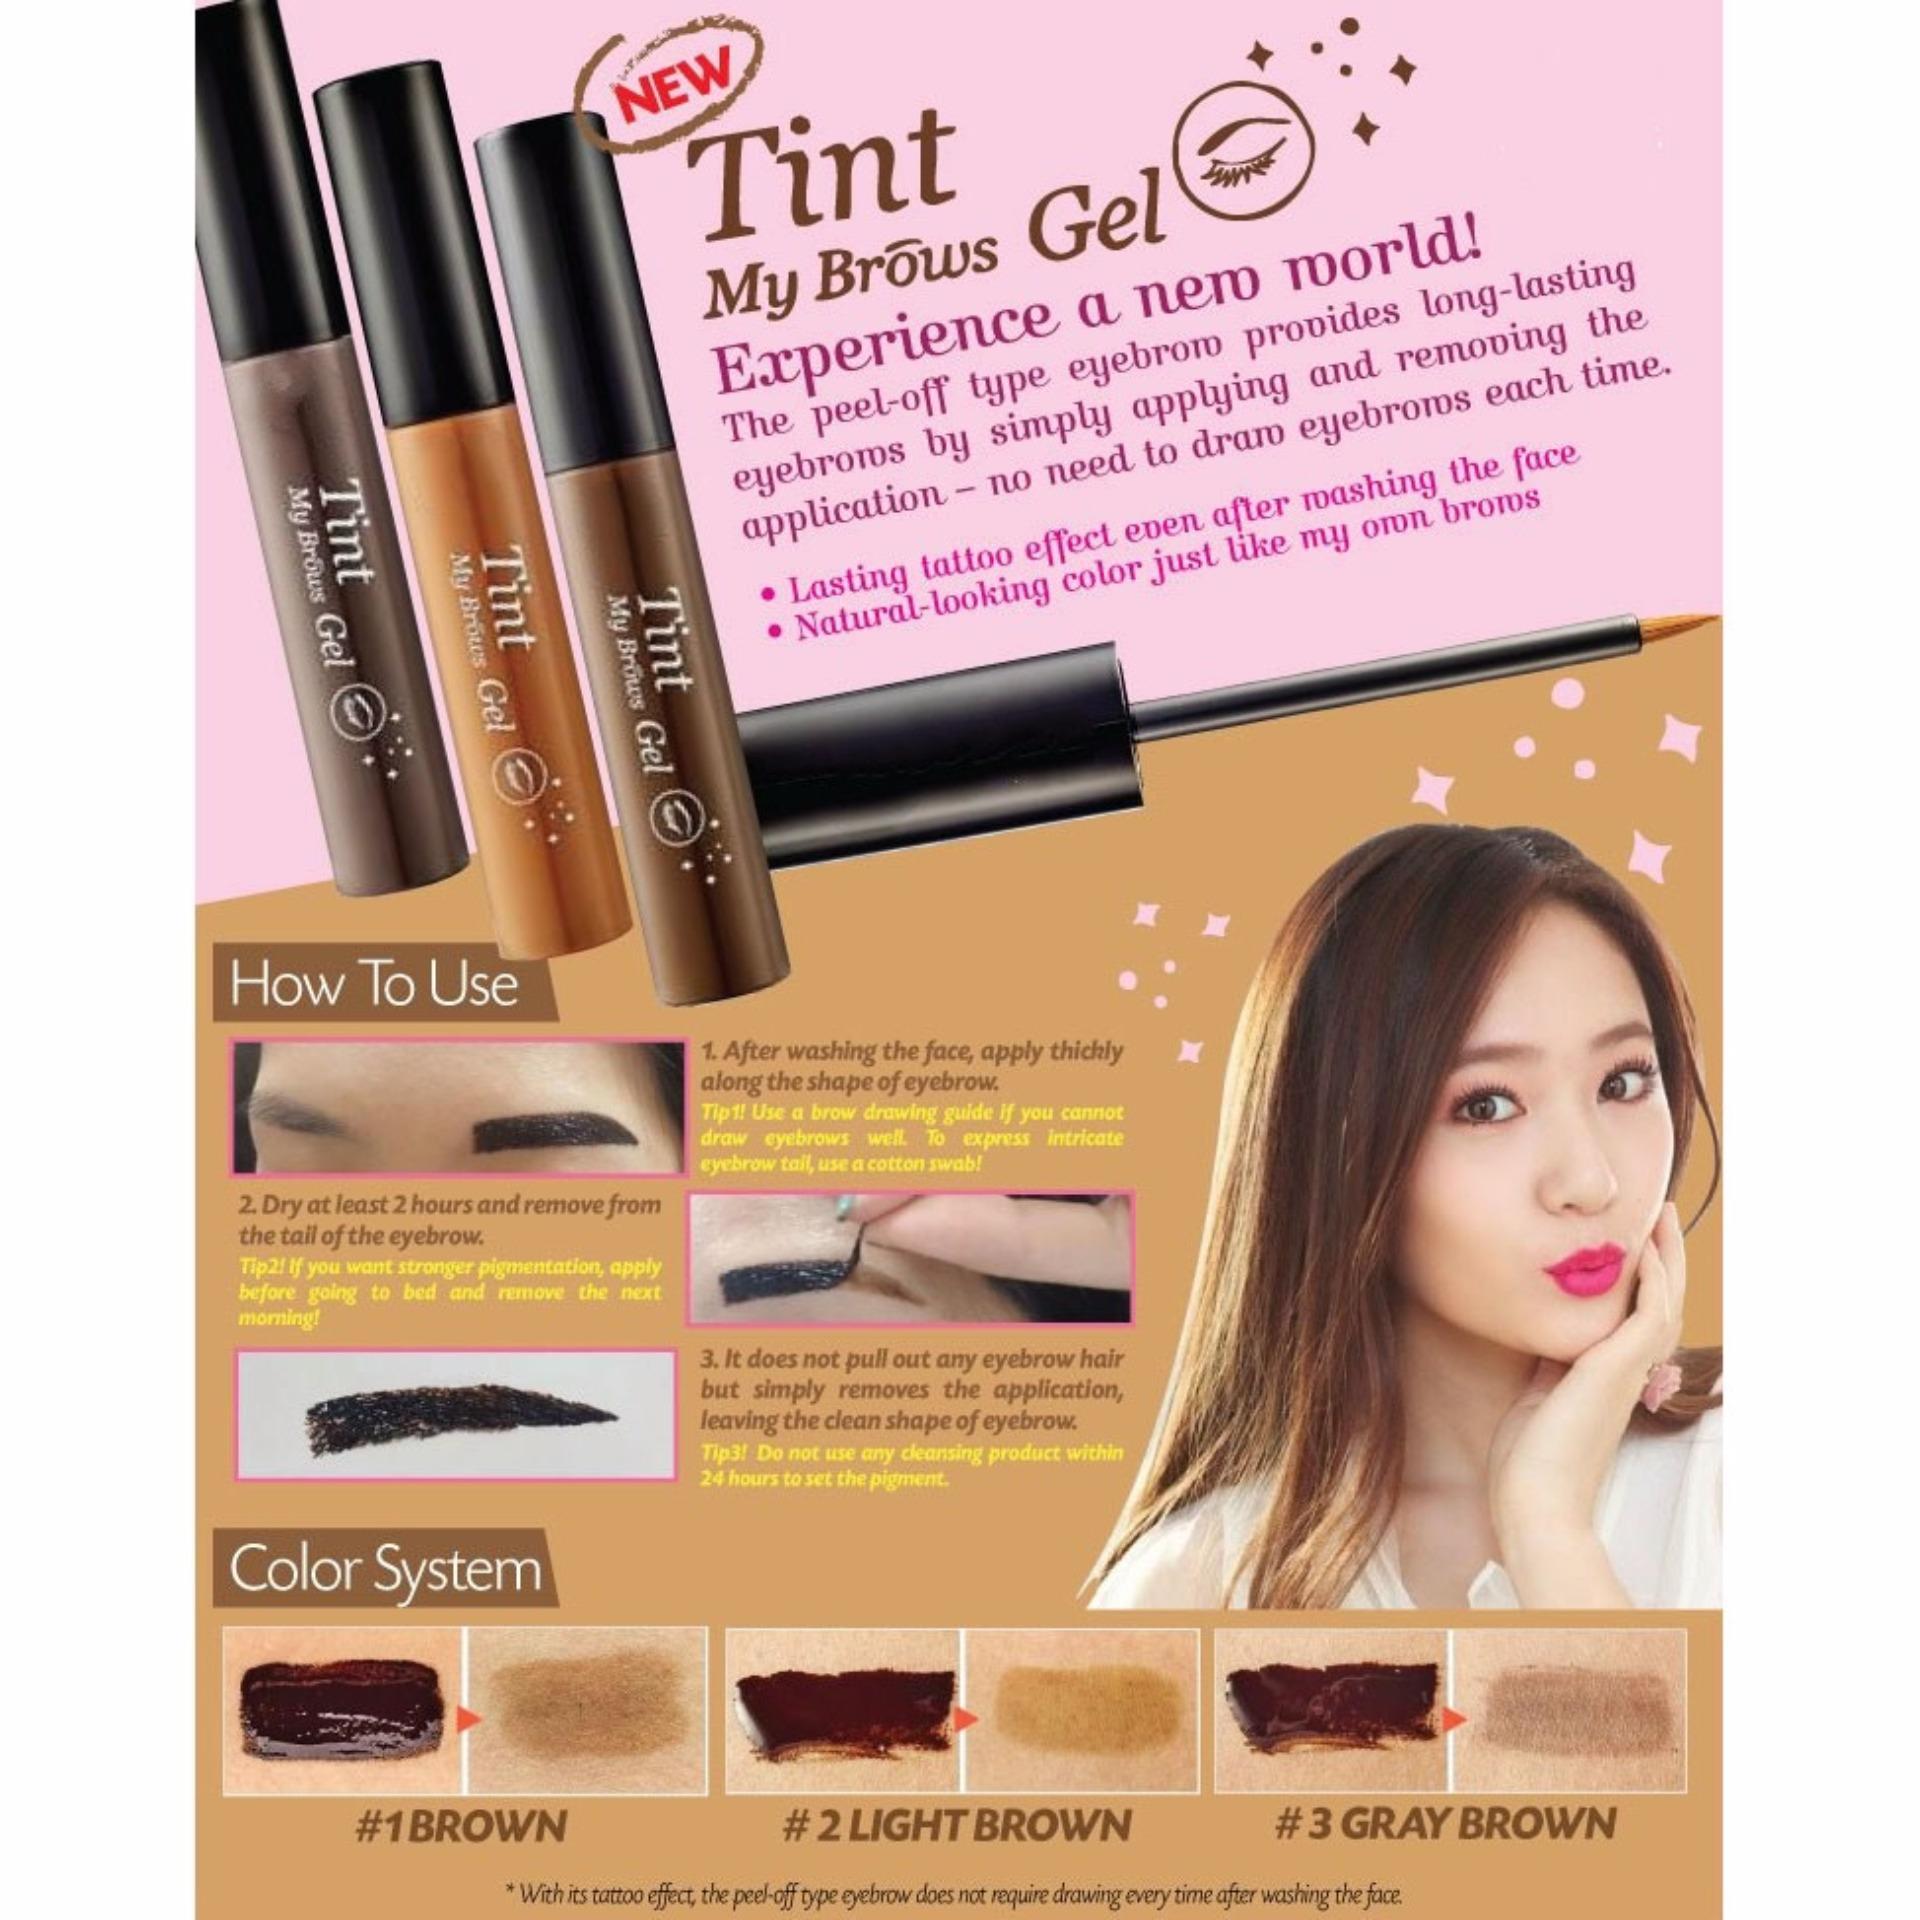 Philippines Korea Tint My Brows Gel Dark Brown 5g New Price Drawing Eyebrow